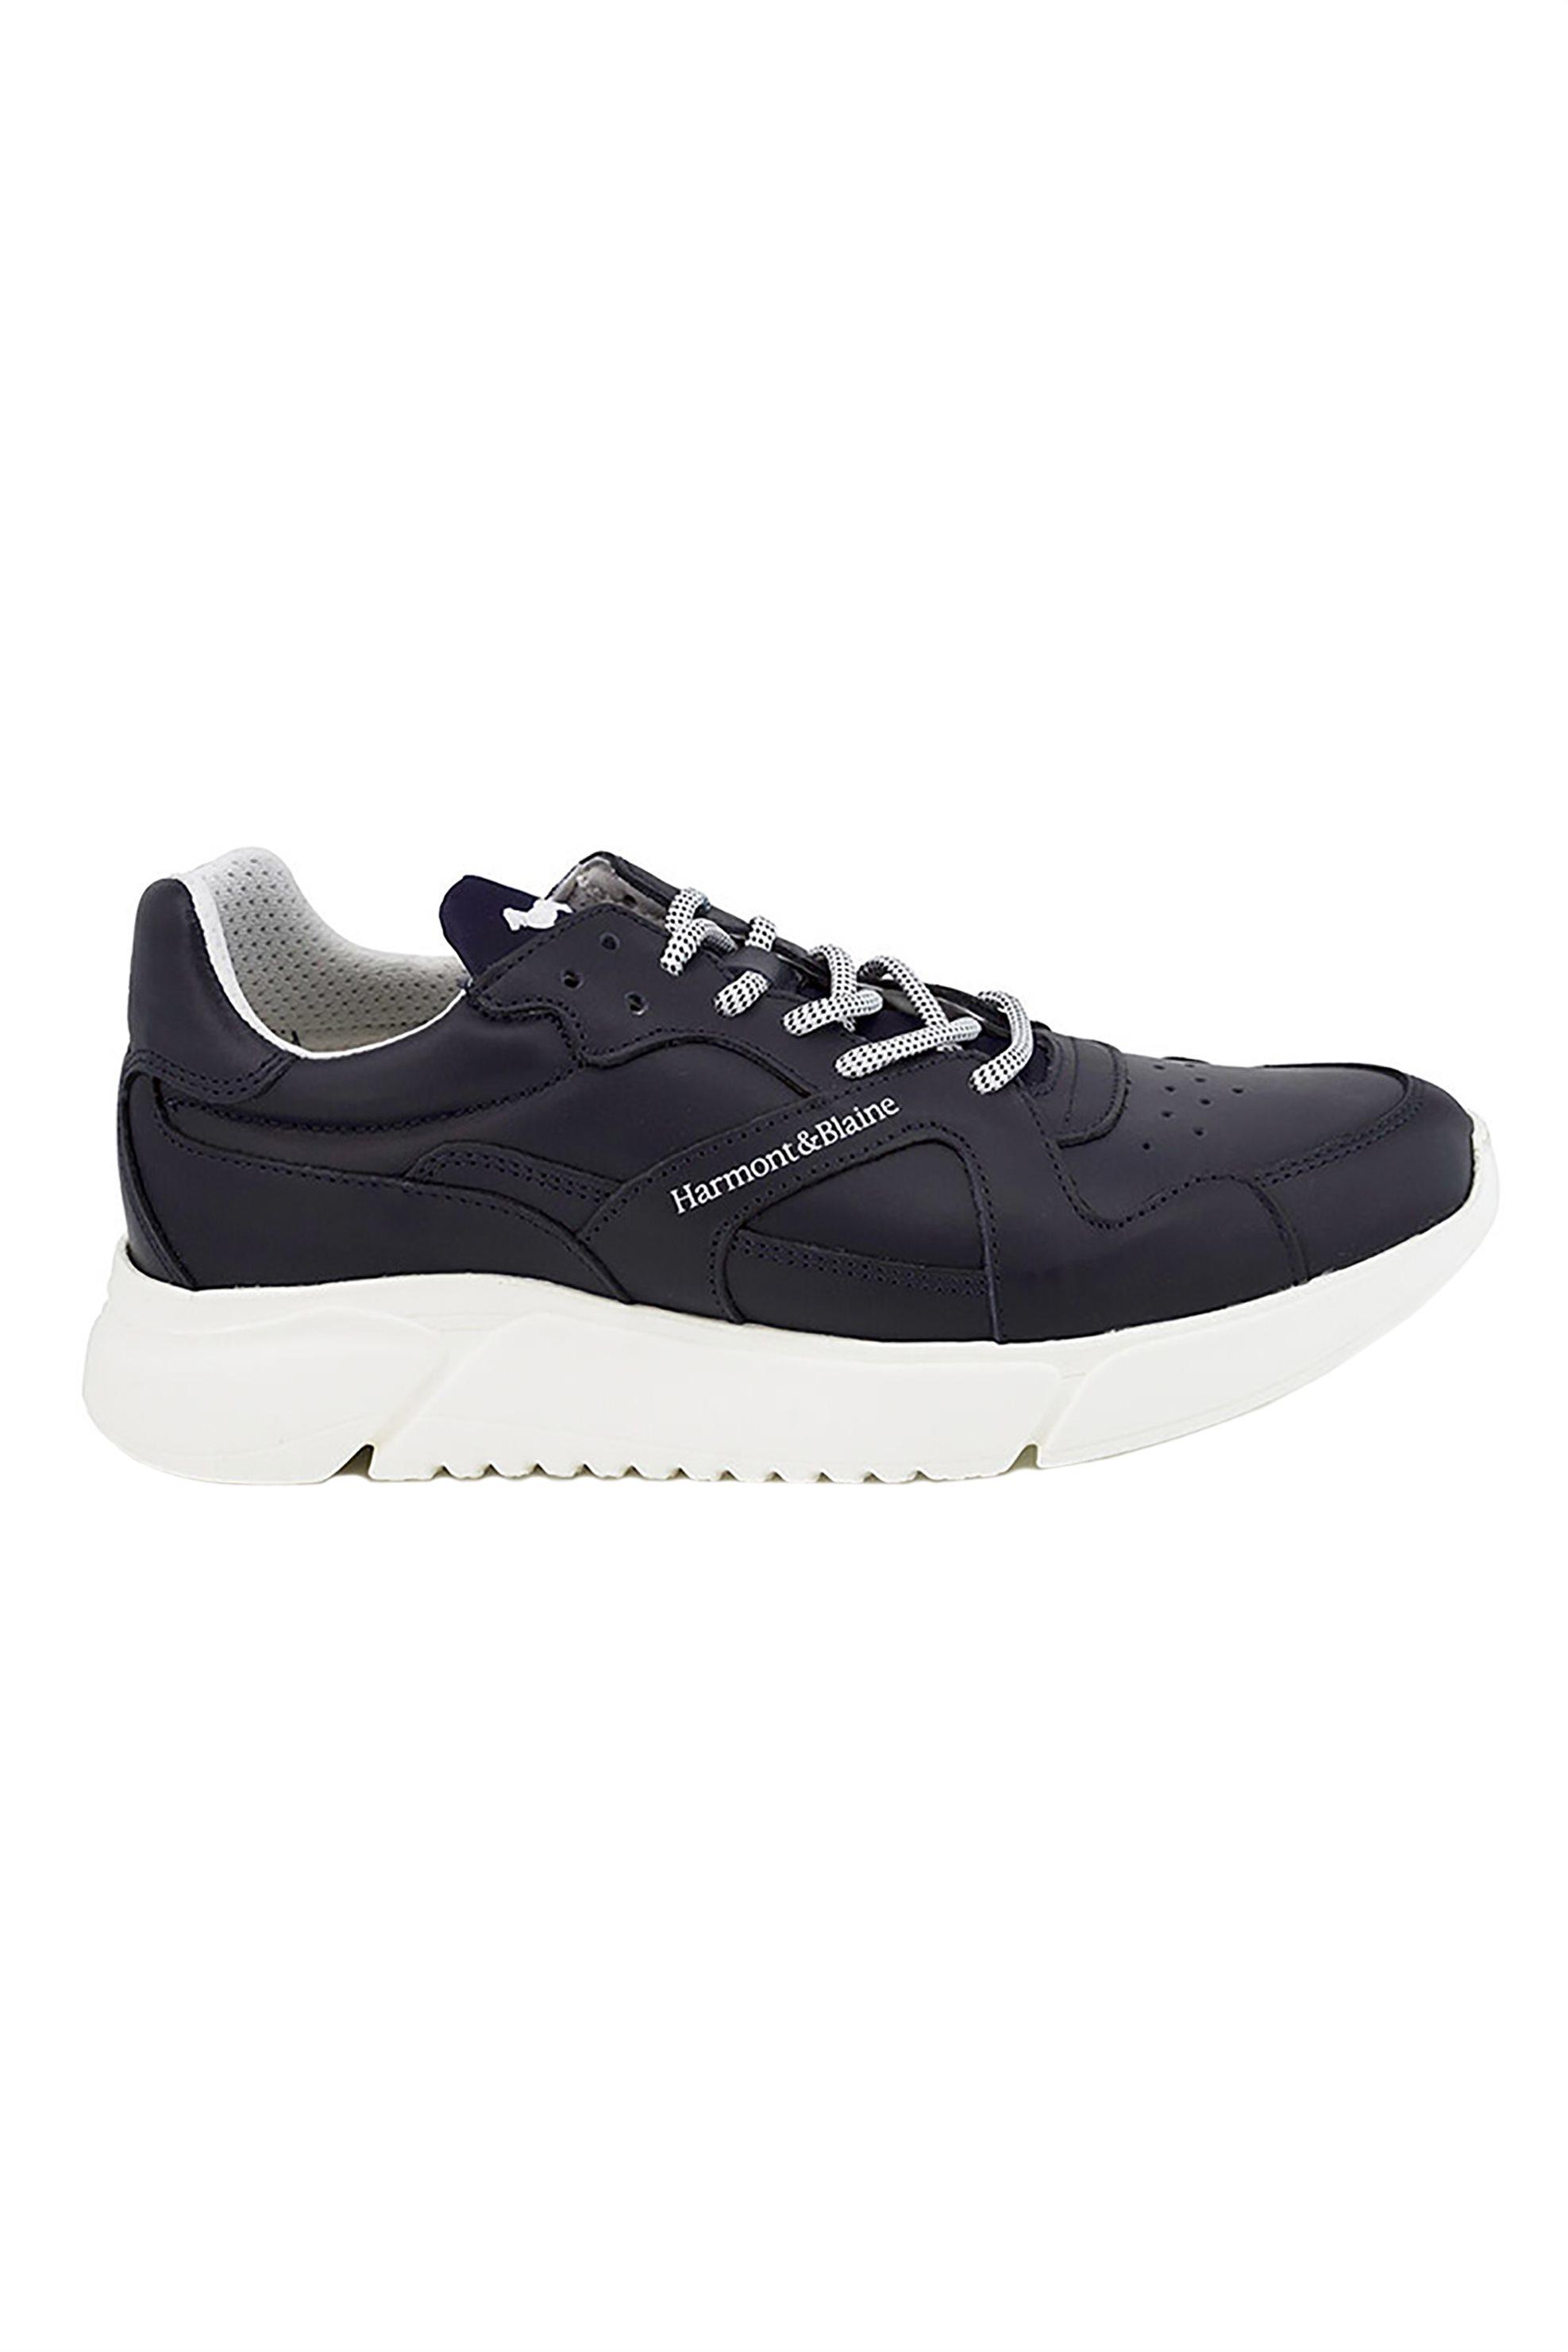 Harmont & Blaine ανδρικά δερμάτινα sneakers με logo print – EFM201181-5010 – Μπλε Σκούρο